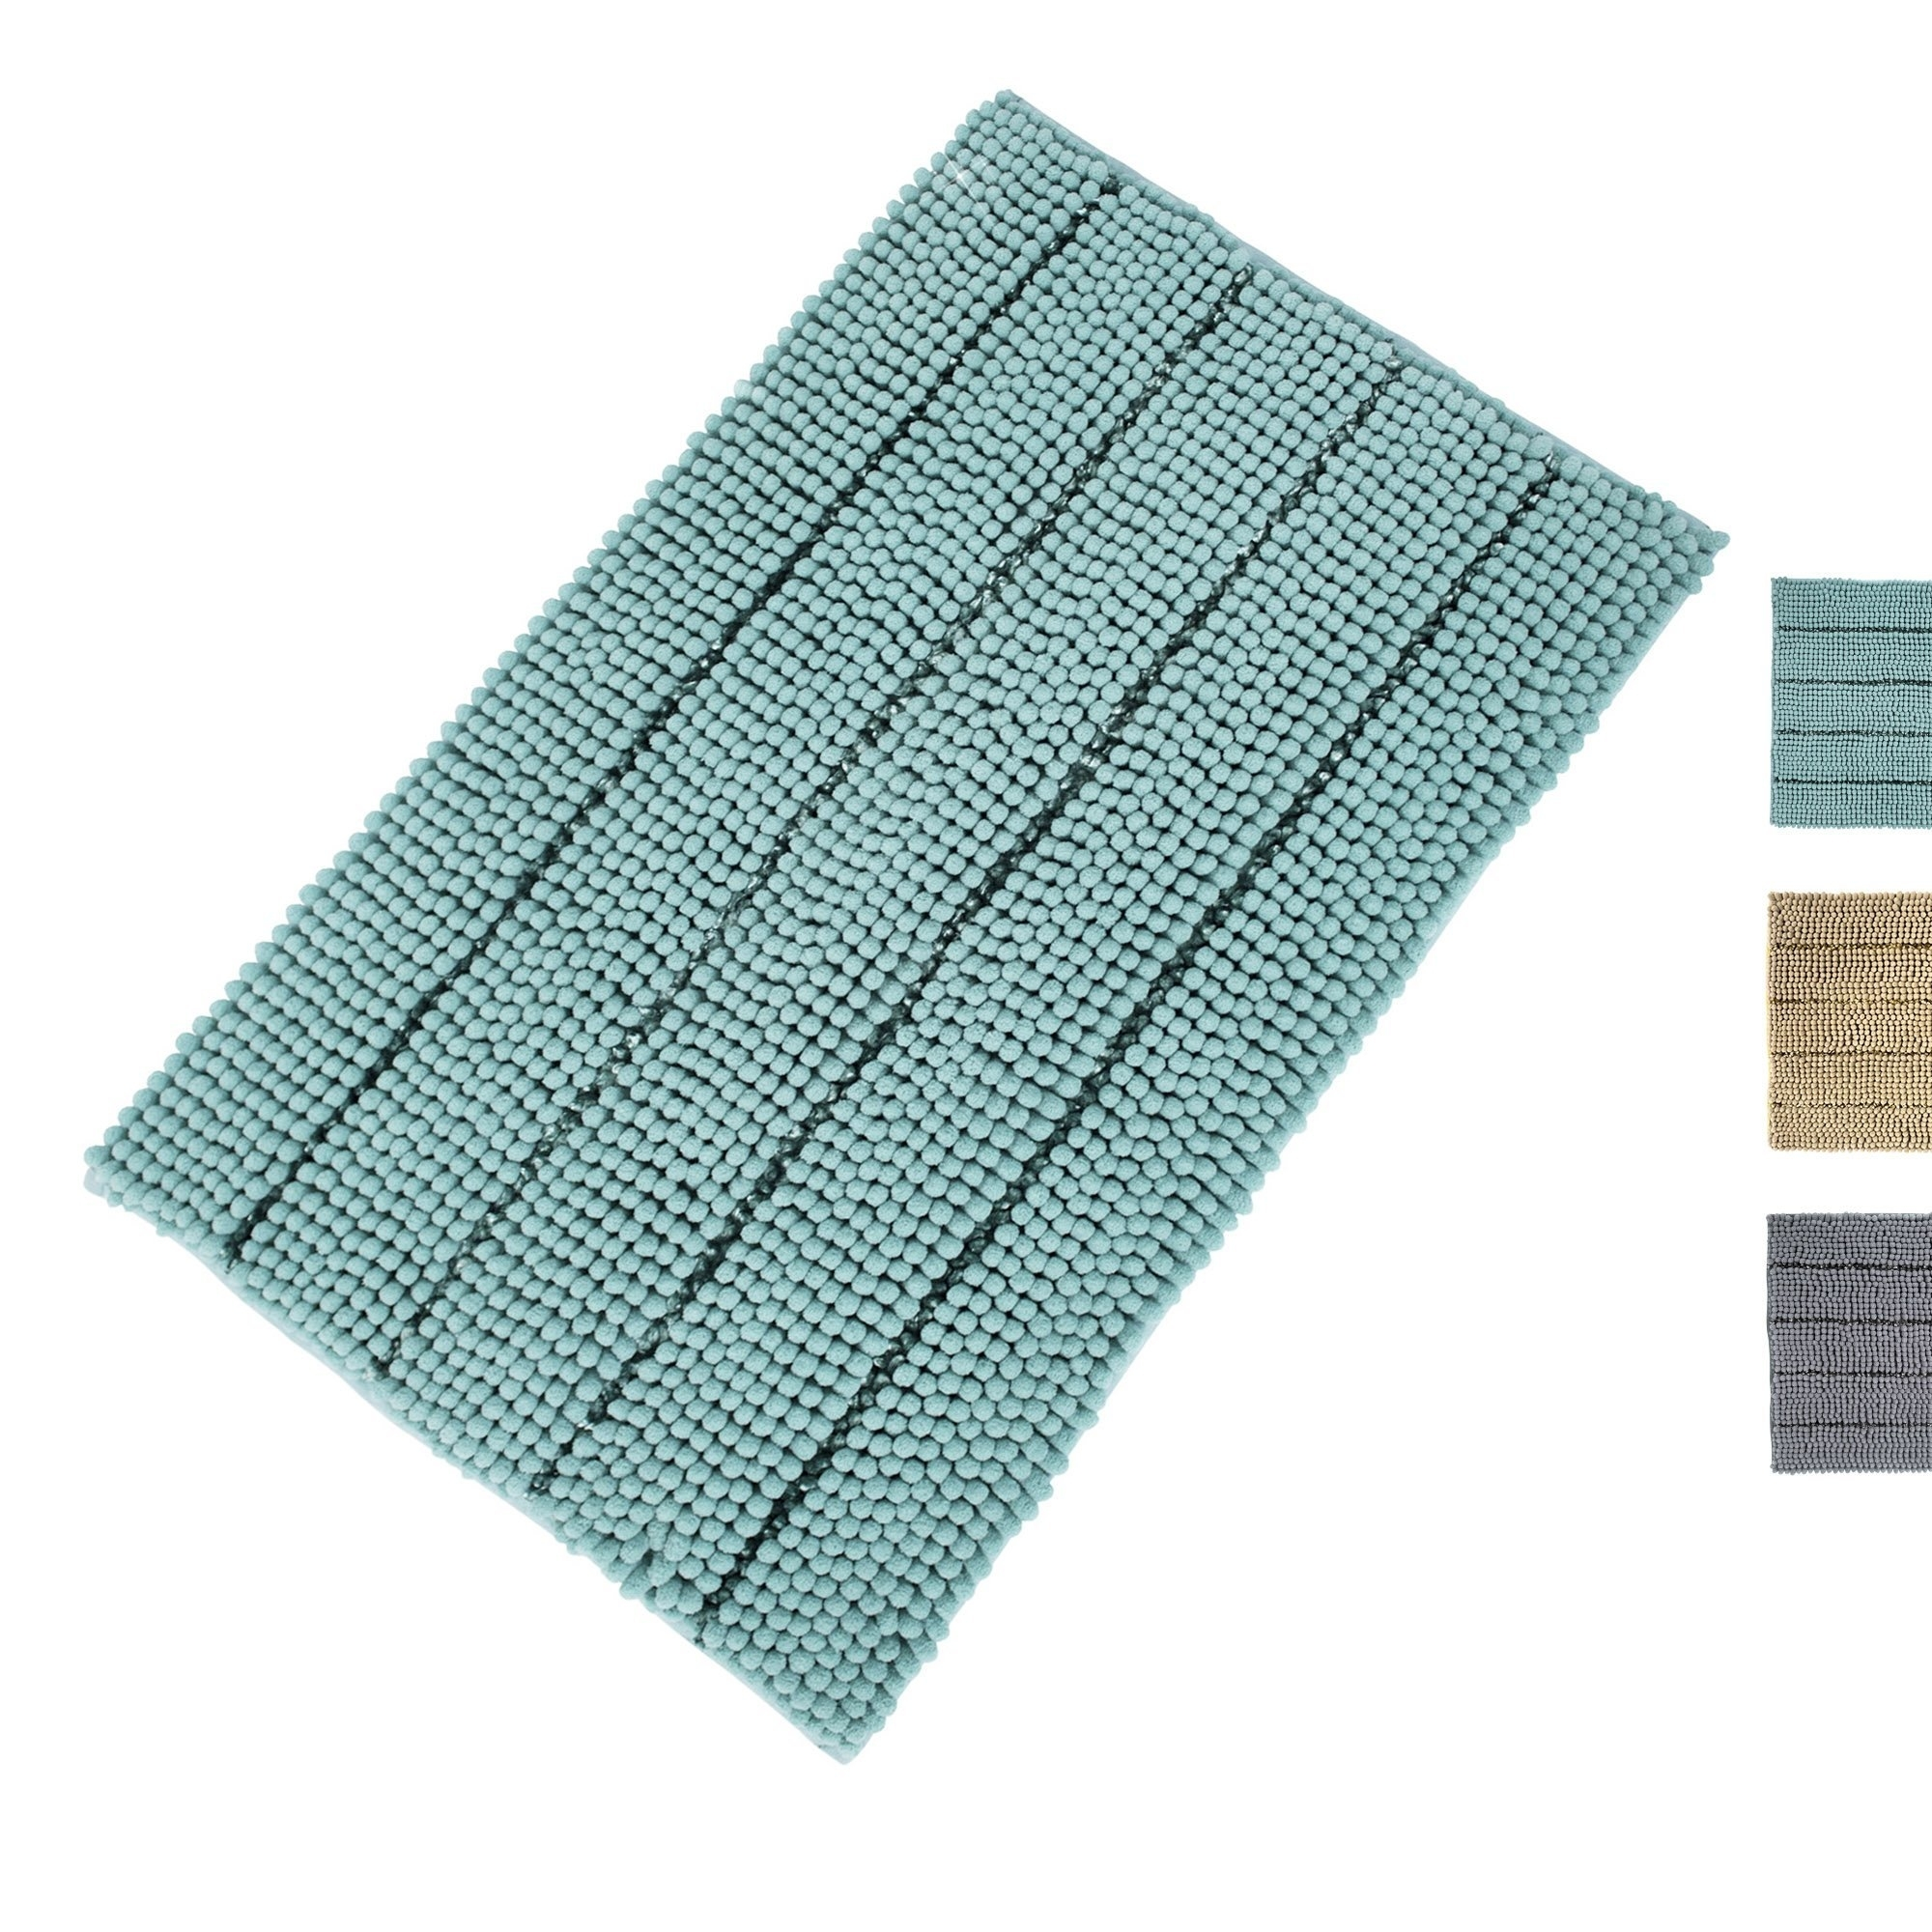 74 9 Costbuys 4 Color Bath Mat Bathroom Carpet Bathroom